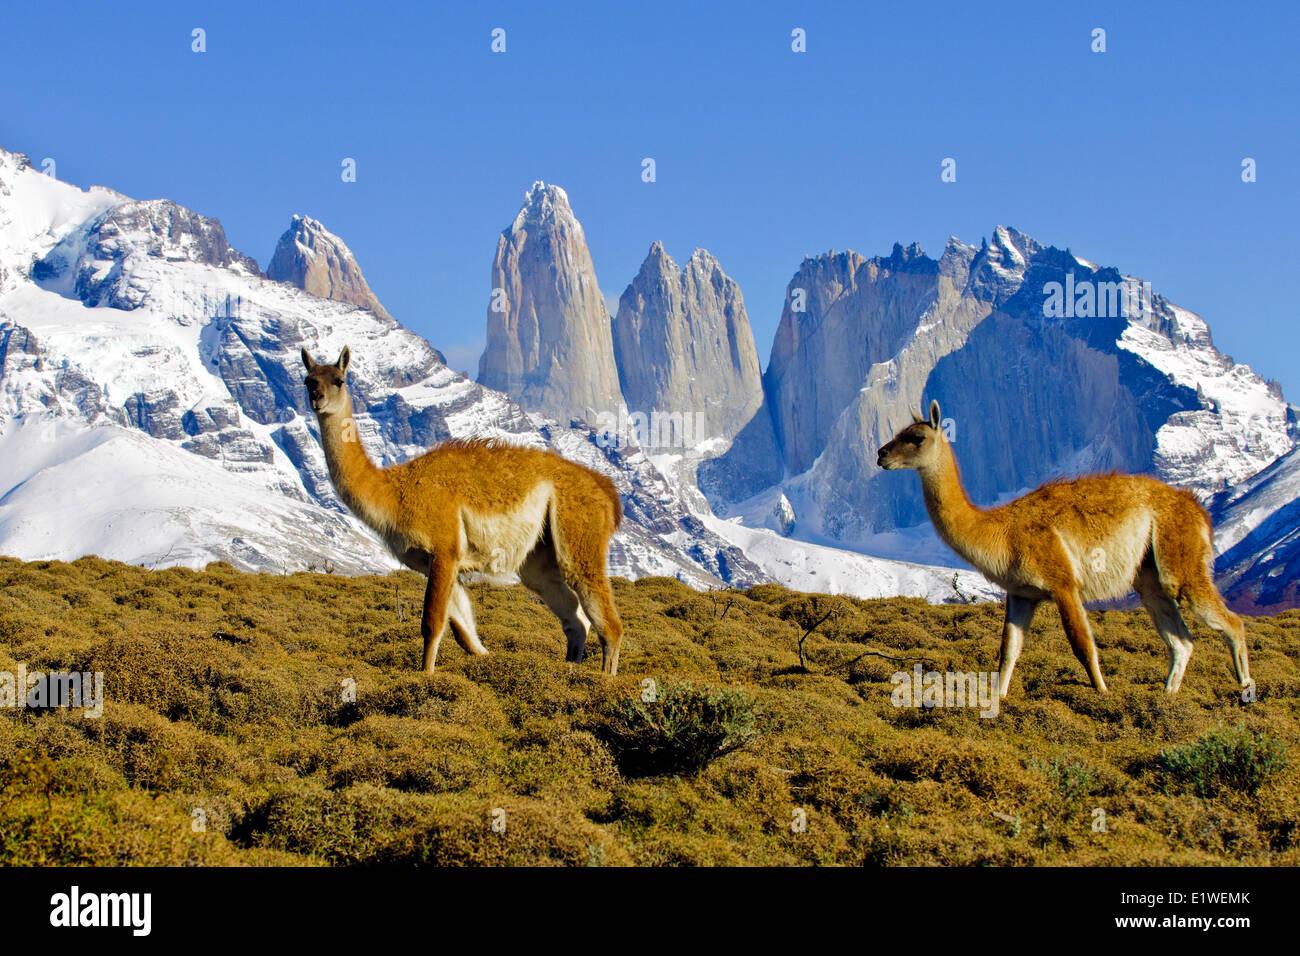 Erwachsenen Guanakos (Lama Guanicoe), Nationalpark Torres Del Paine, Patagonien, Süd-Chile, Südamerika Stockbild